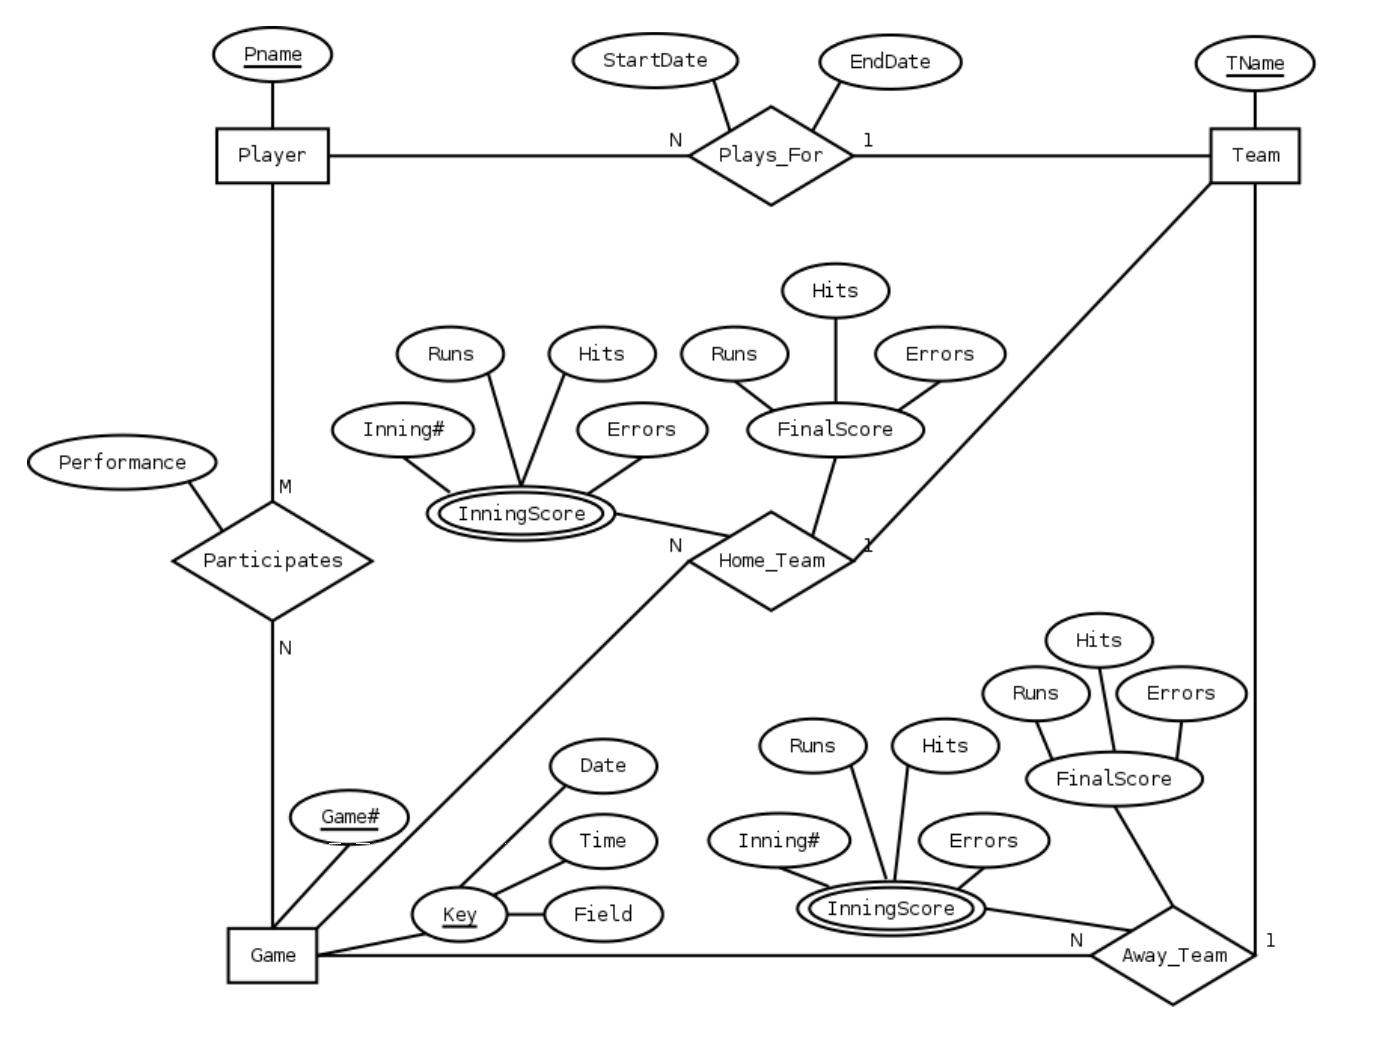 create er diagram from mysql db